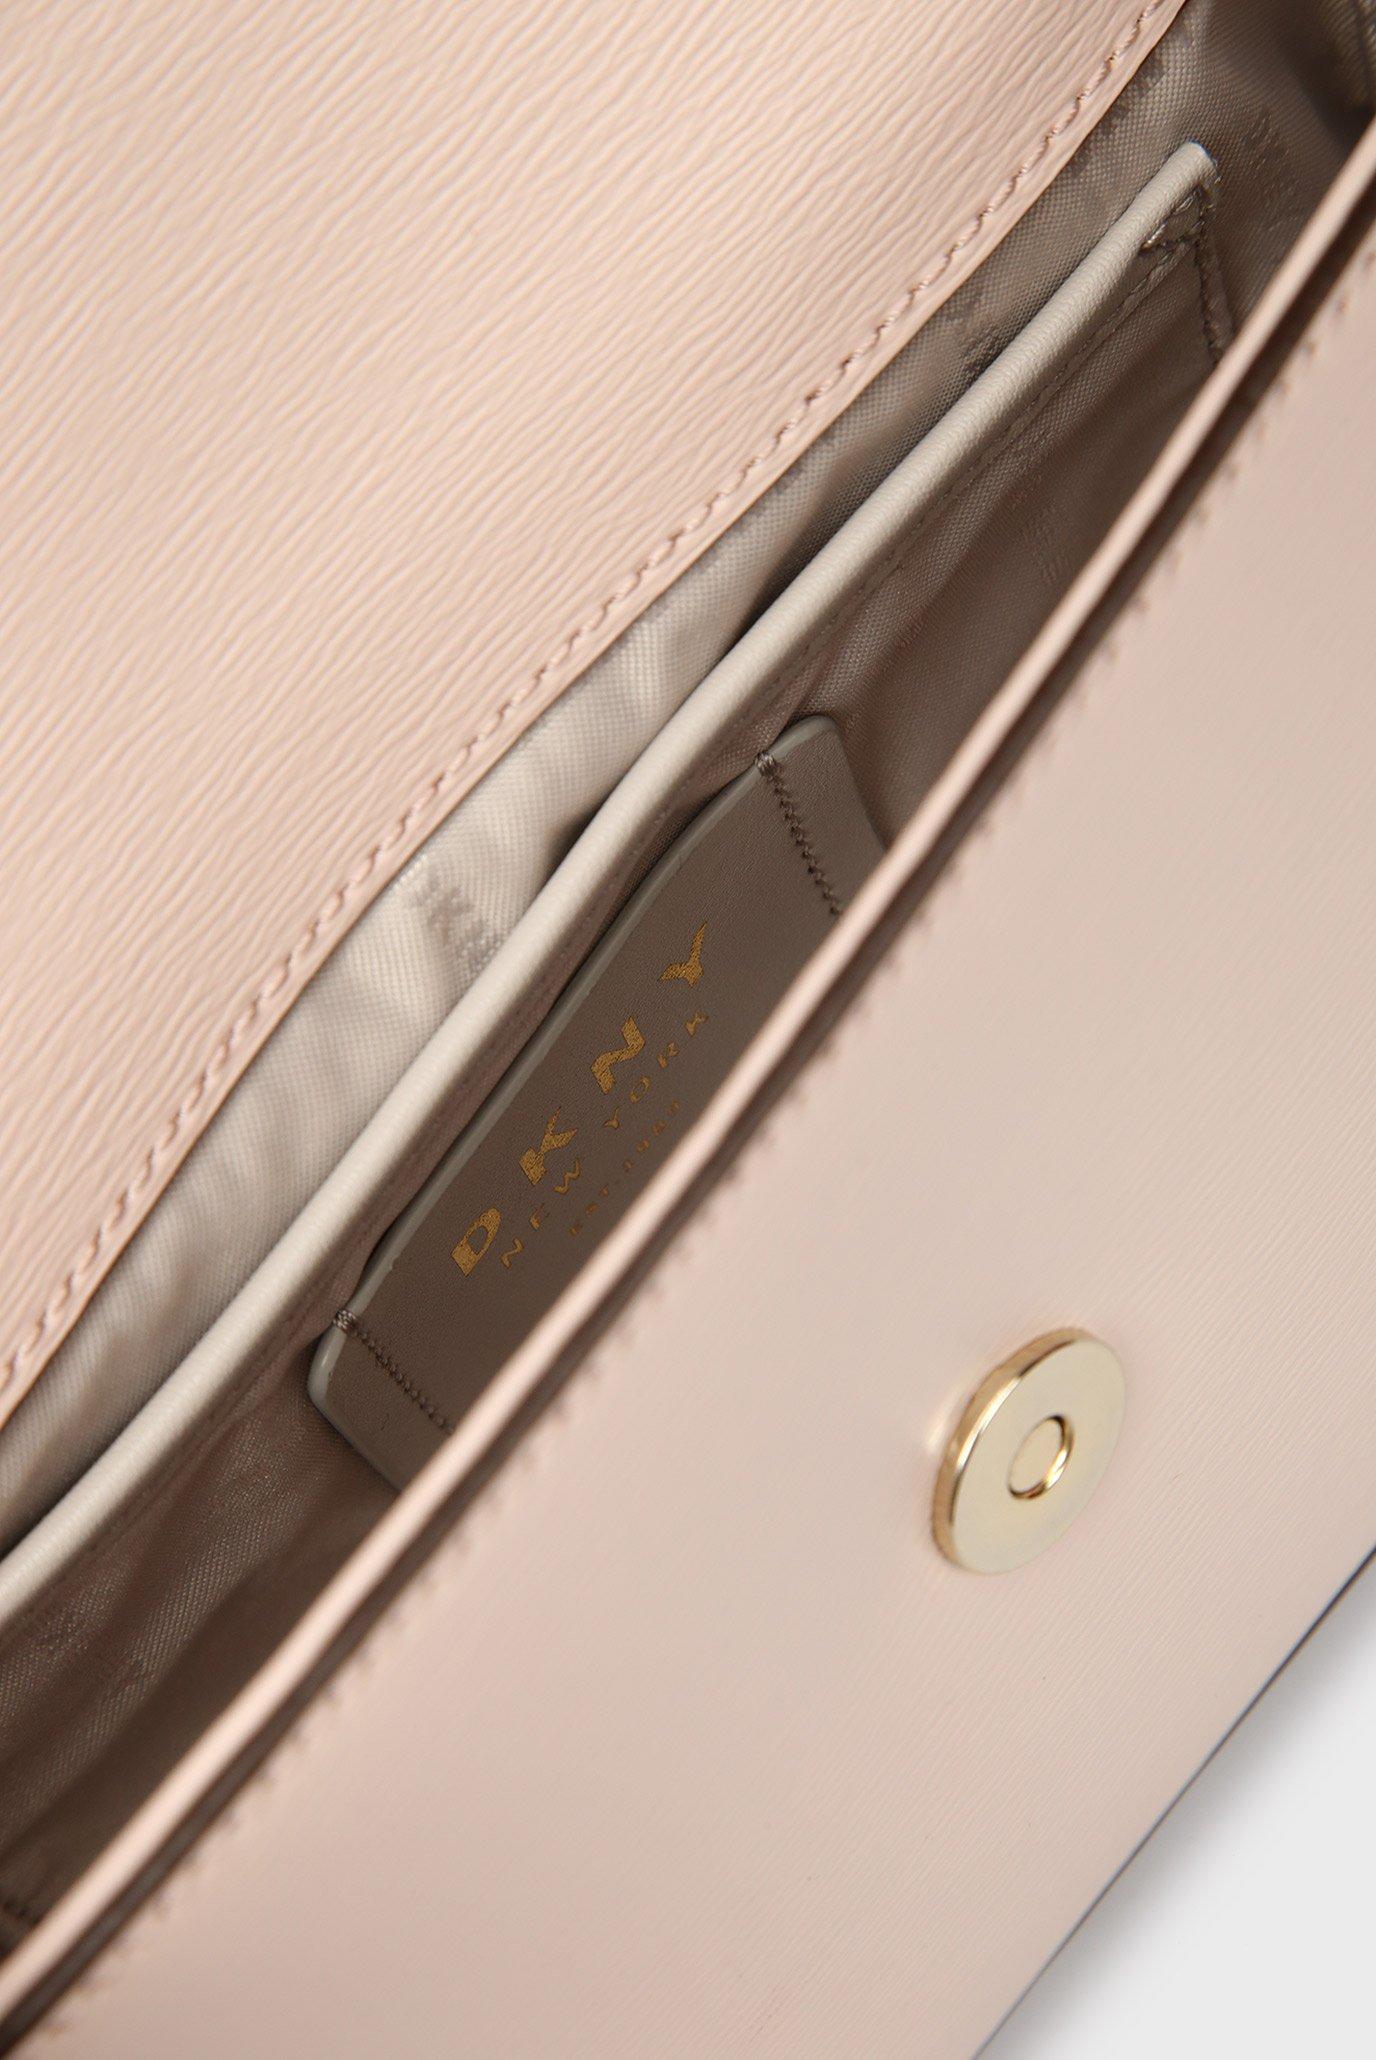 4be891135e21 Купить Женская розовая сумка через плечо BRYANT-MD DKNY DKNY R82E3467 – Киев,  Украина. Цены в интернет ...